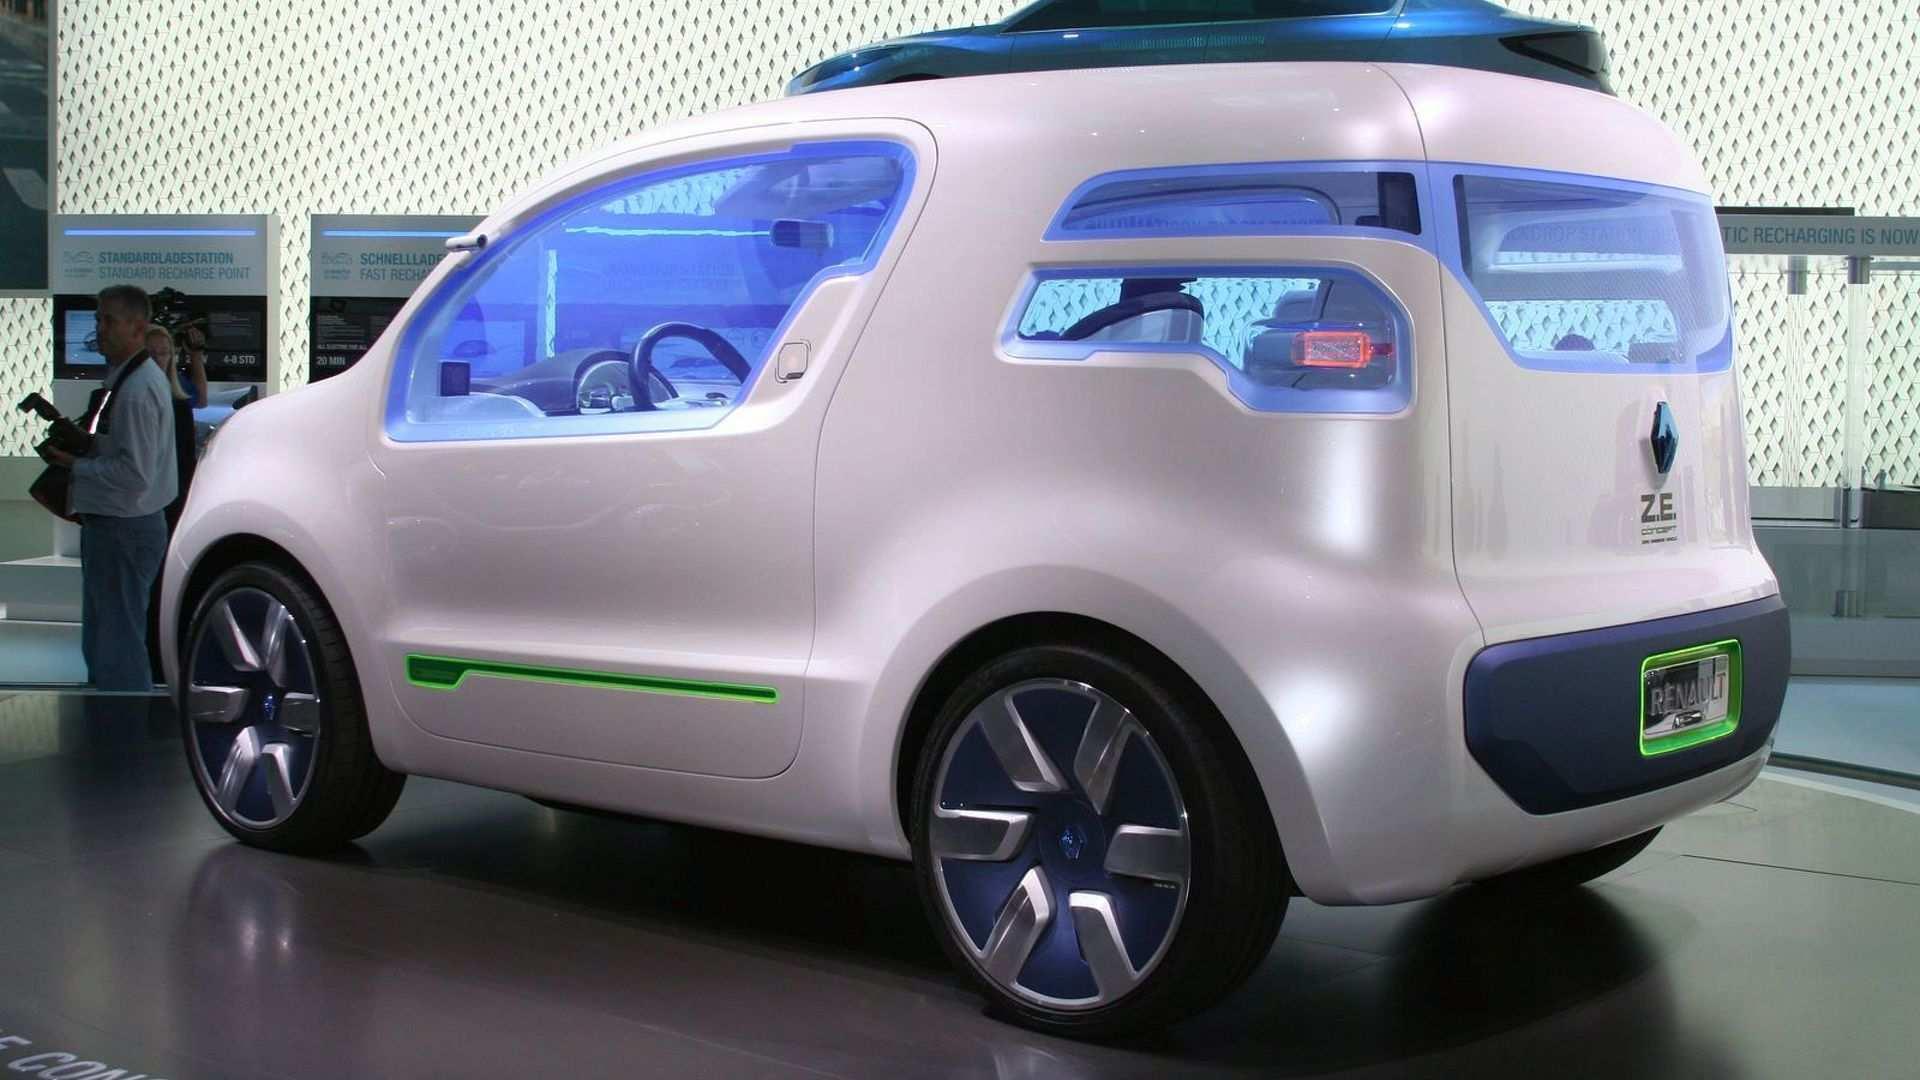 80 Concept of Renault Kangoo 2020 Release Date with Renault Kangoo 2020